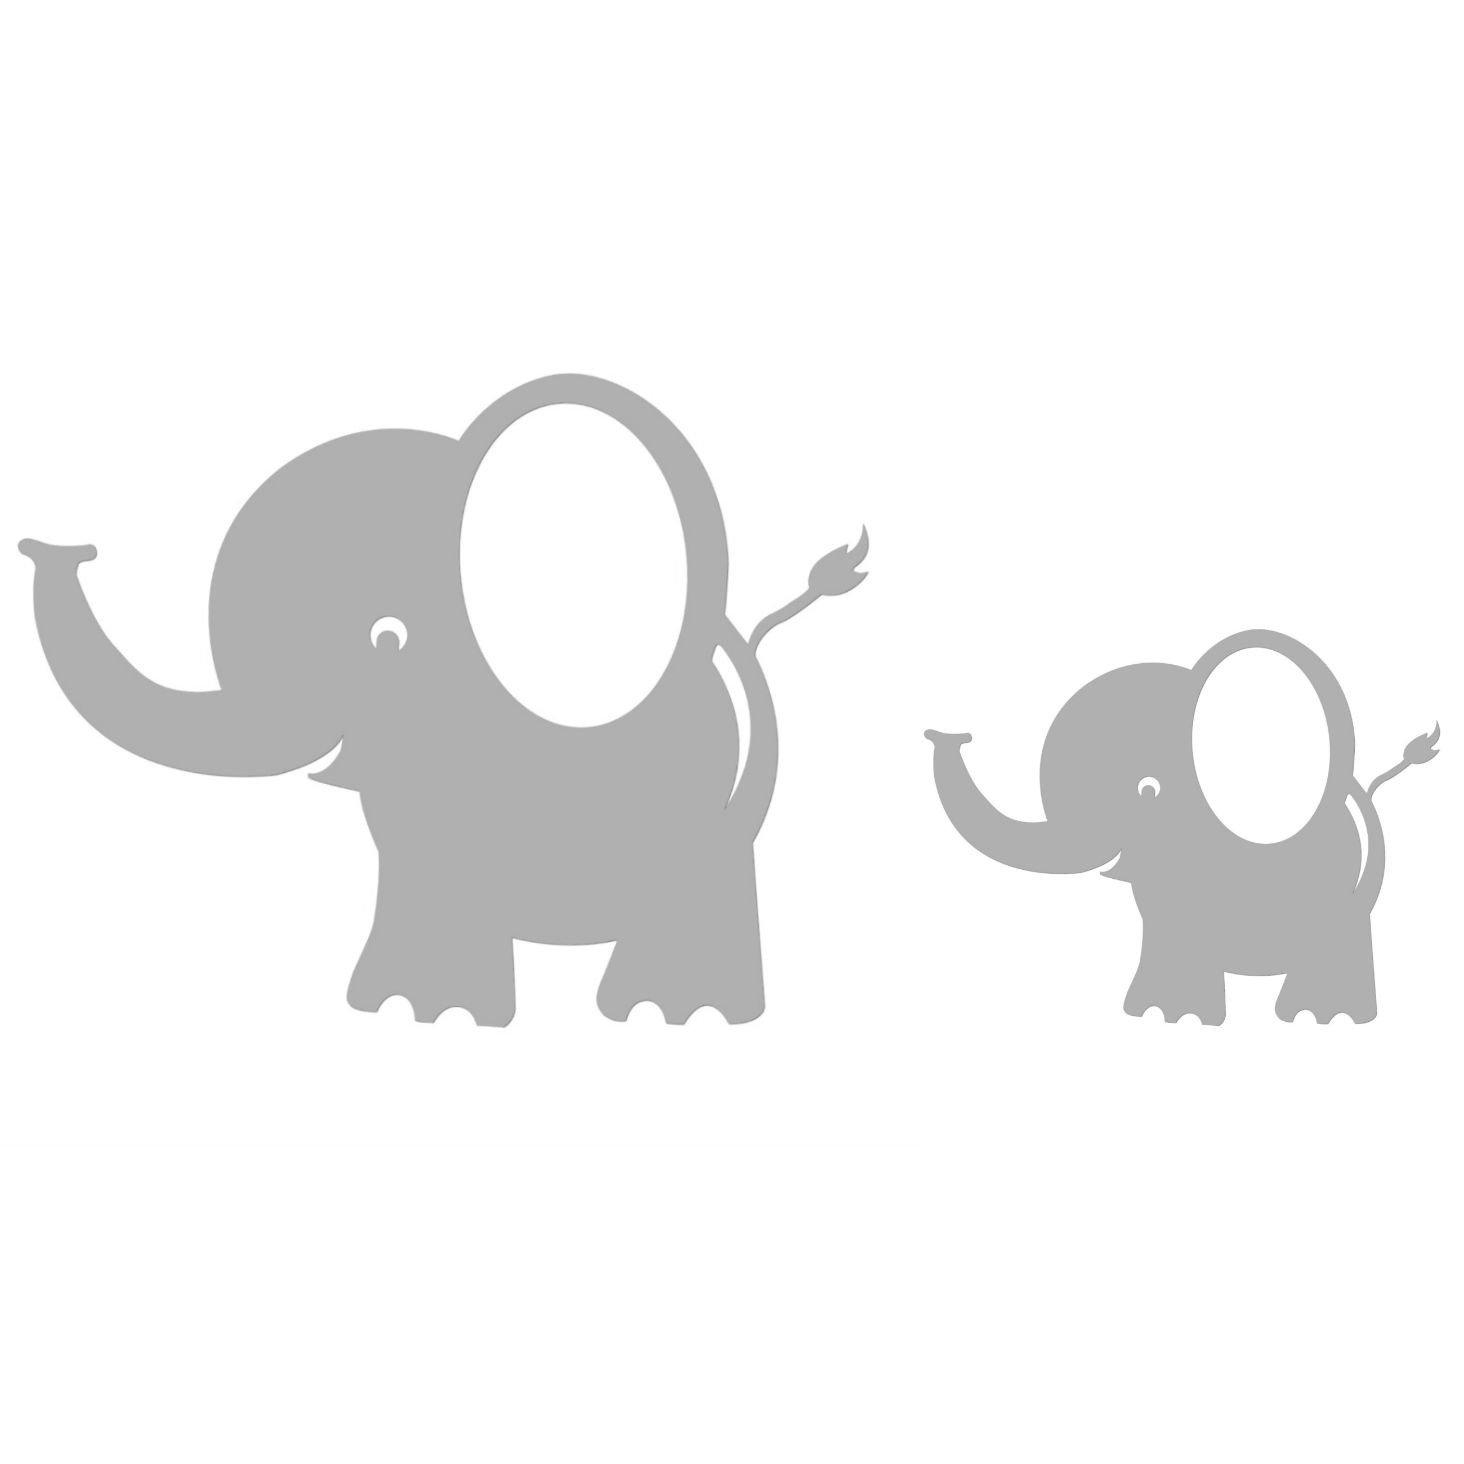 Amazon.com : Elephant Wall Decals, Room Decorations, Light Grey, 5 ...